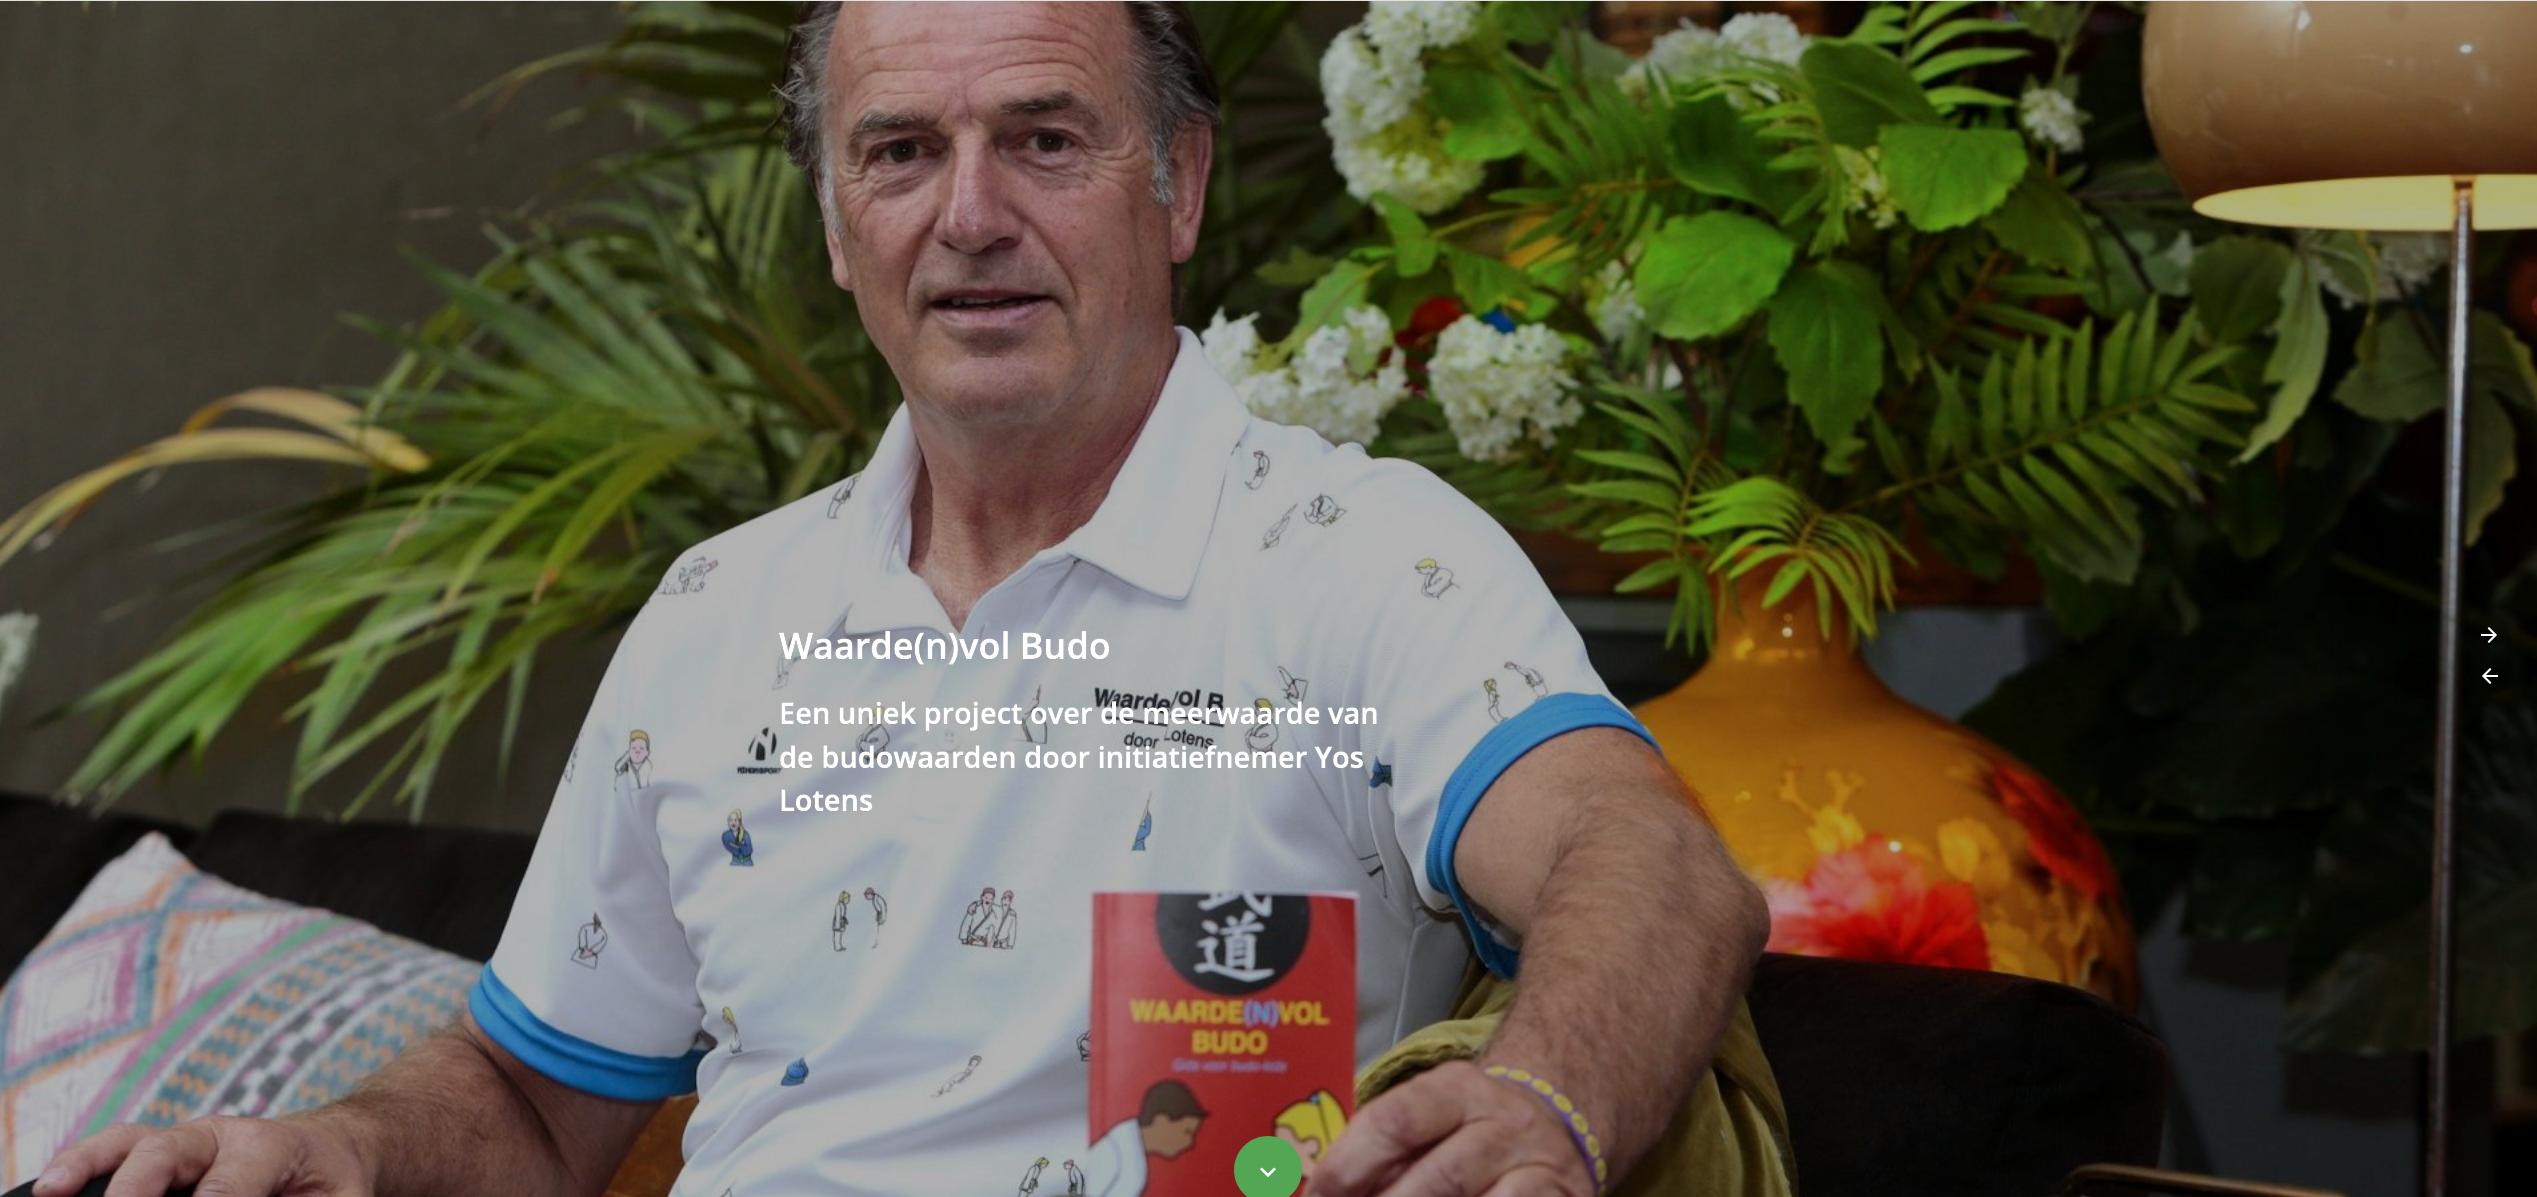 Artikel JBN Magazine over 'Waarde(n)vol Budo'